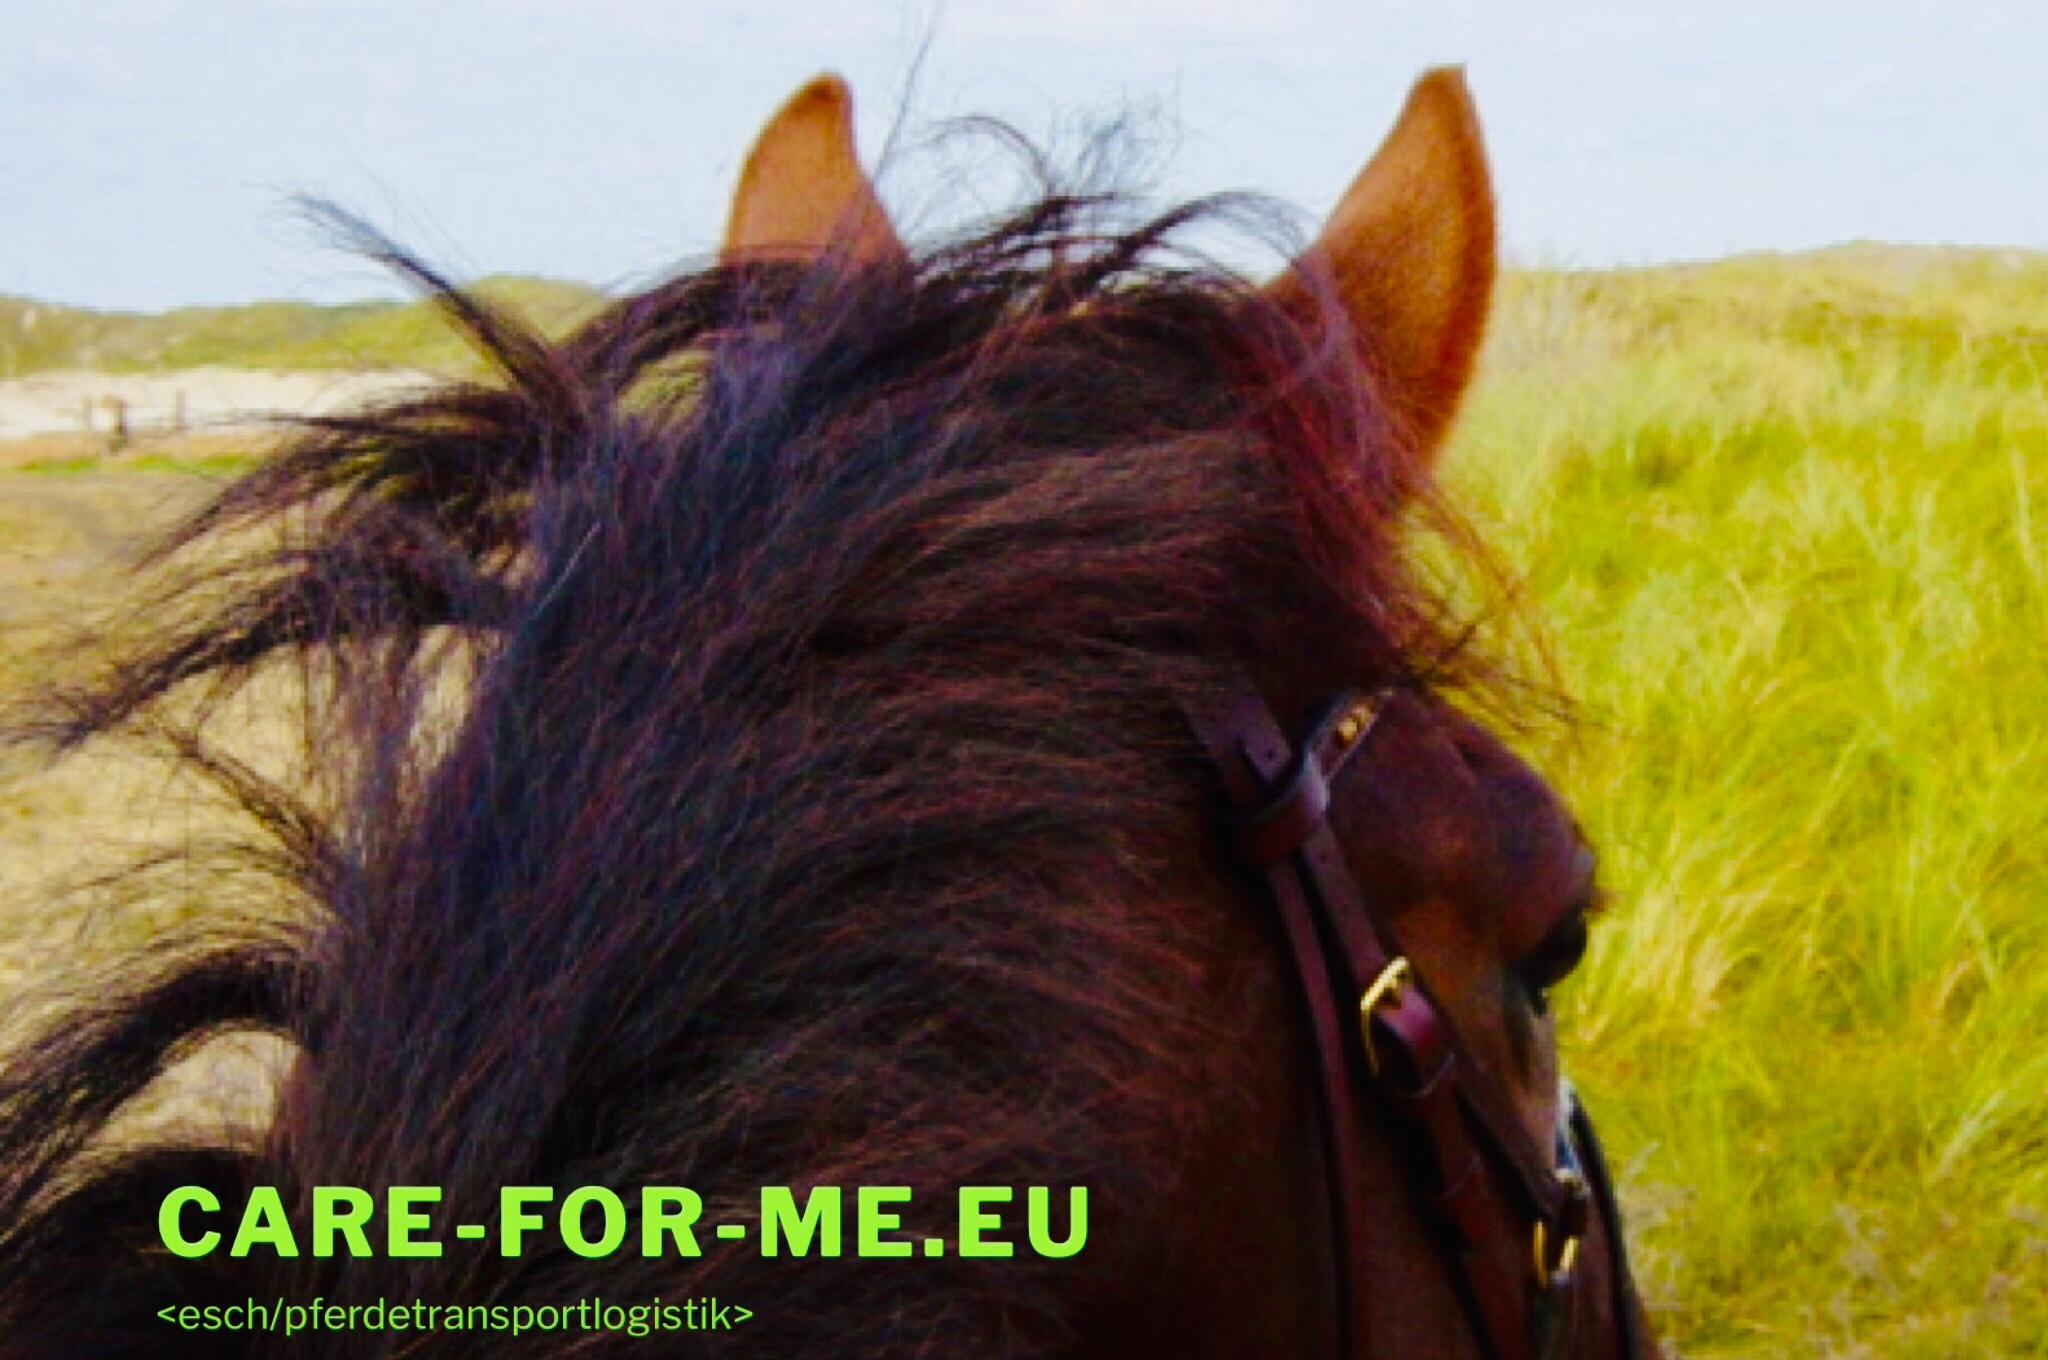 <esch/pferdetransportlogistik>